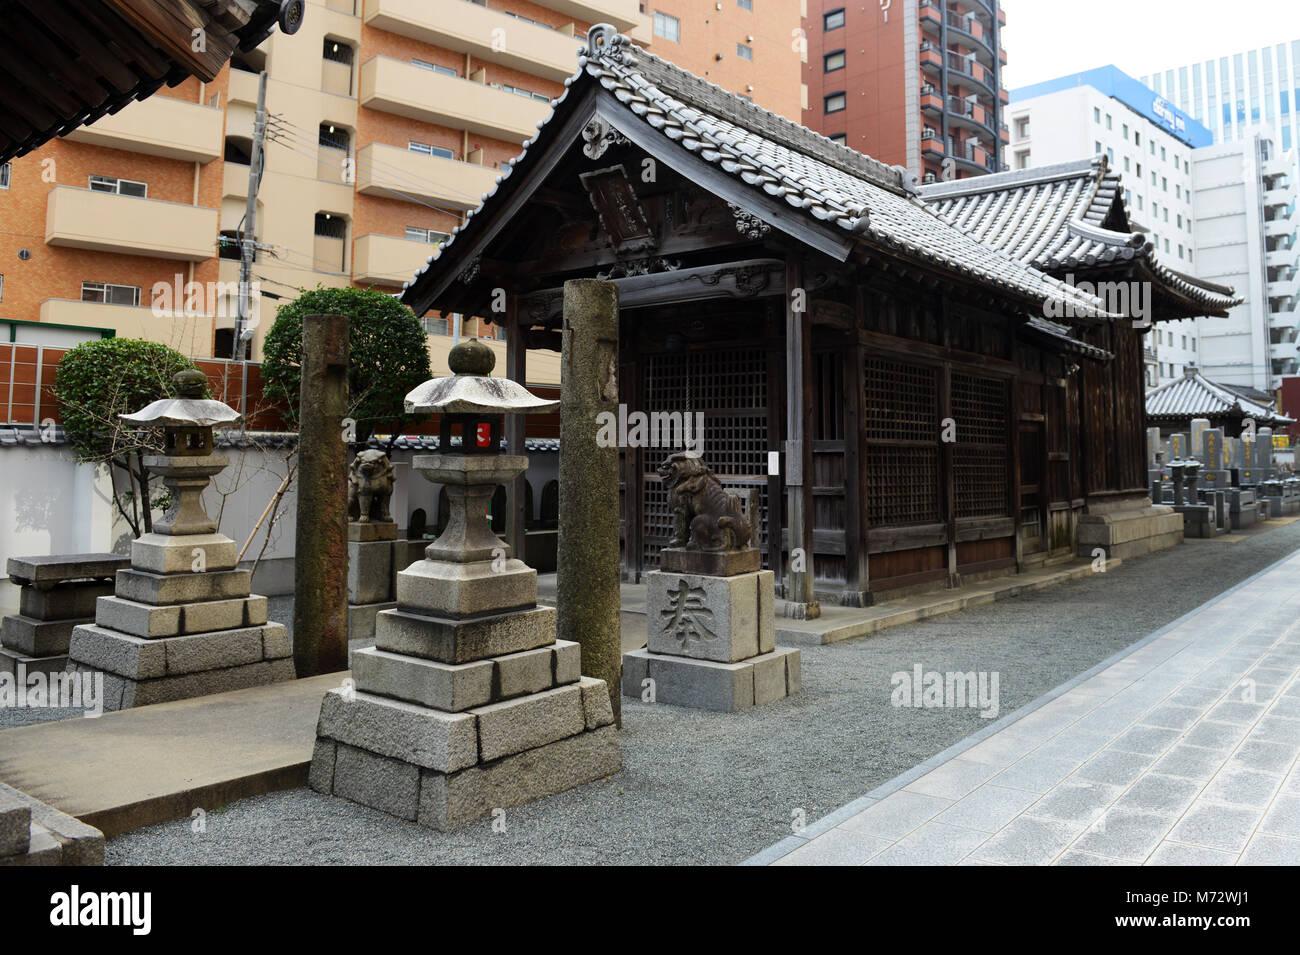 Ryuguji Buddhist temple in Fukuoka, Japan. - Stock Image